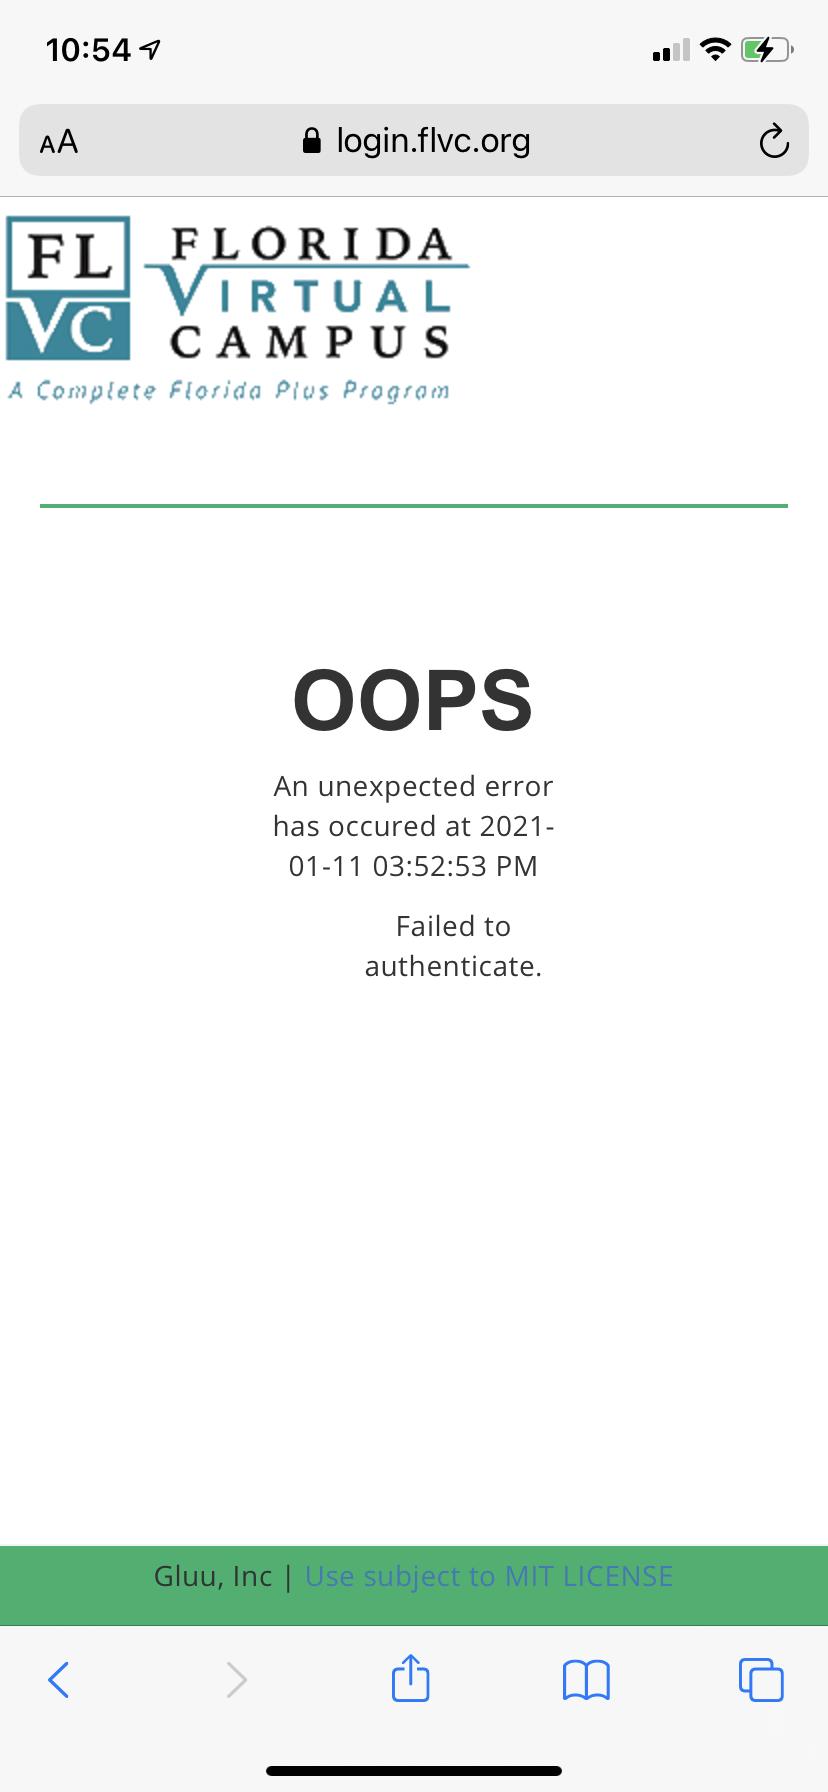 oopserror